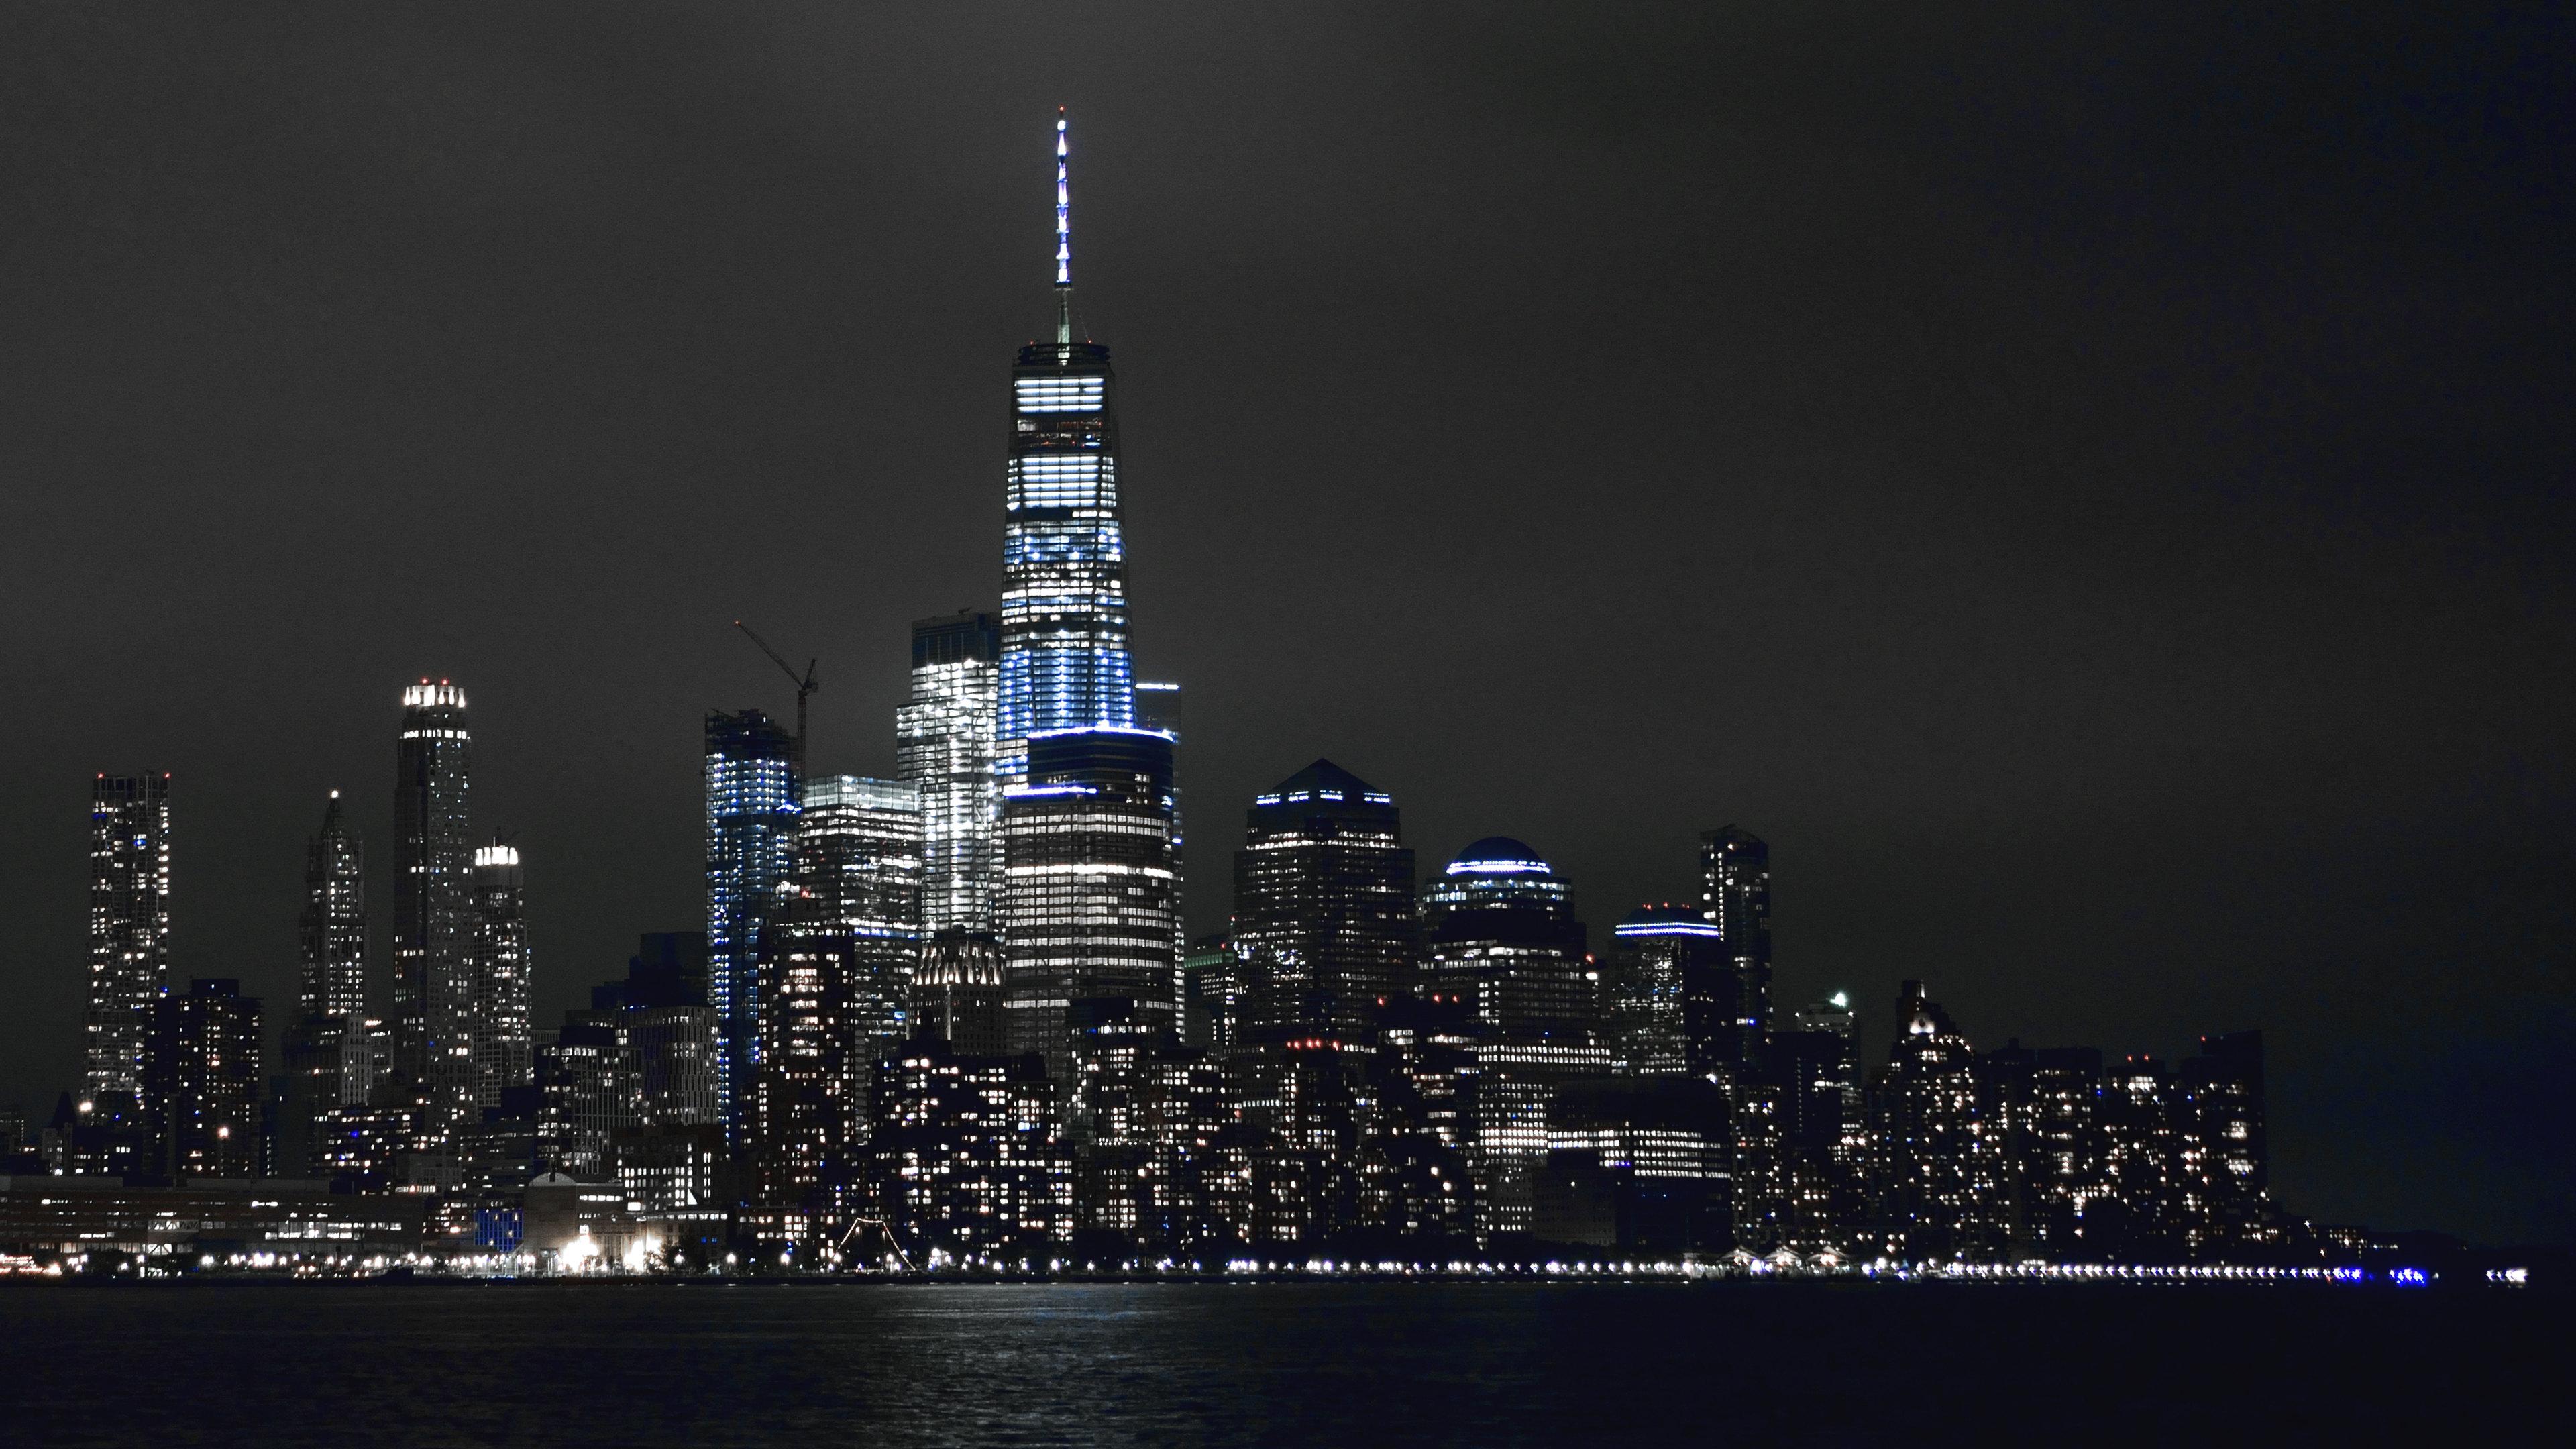 new york buildings lights 5k 1538069570 - New York Buildings Lights 5k - world wallpapers, night wallpapers, new york wallpapers, lights wallpapers, hd-wallpapers, buildings wallpapers, 8k wallpapers, 5k wallpapers, 4k-wallpapers, 10k wallpapers